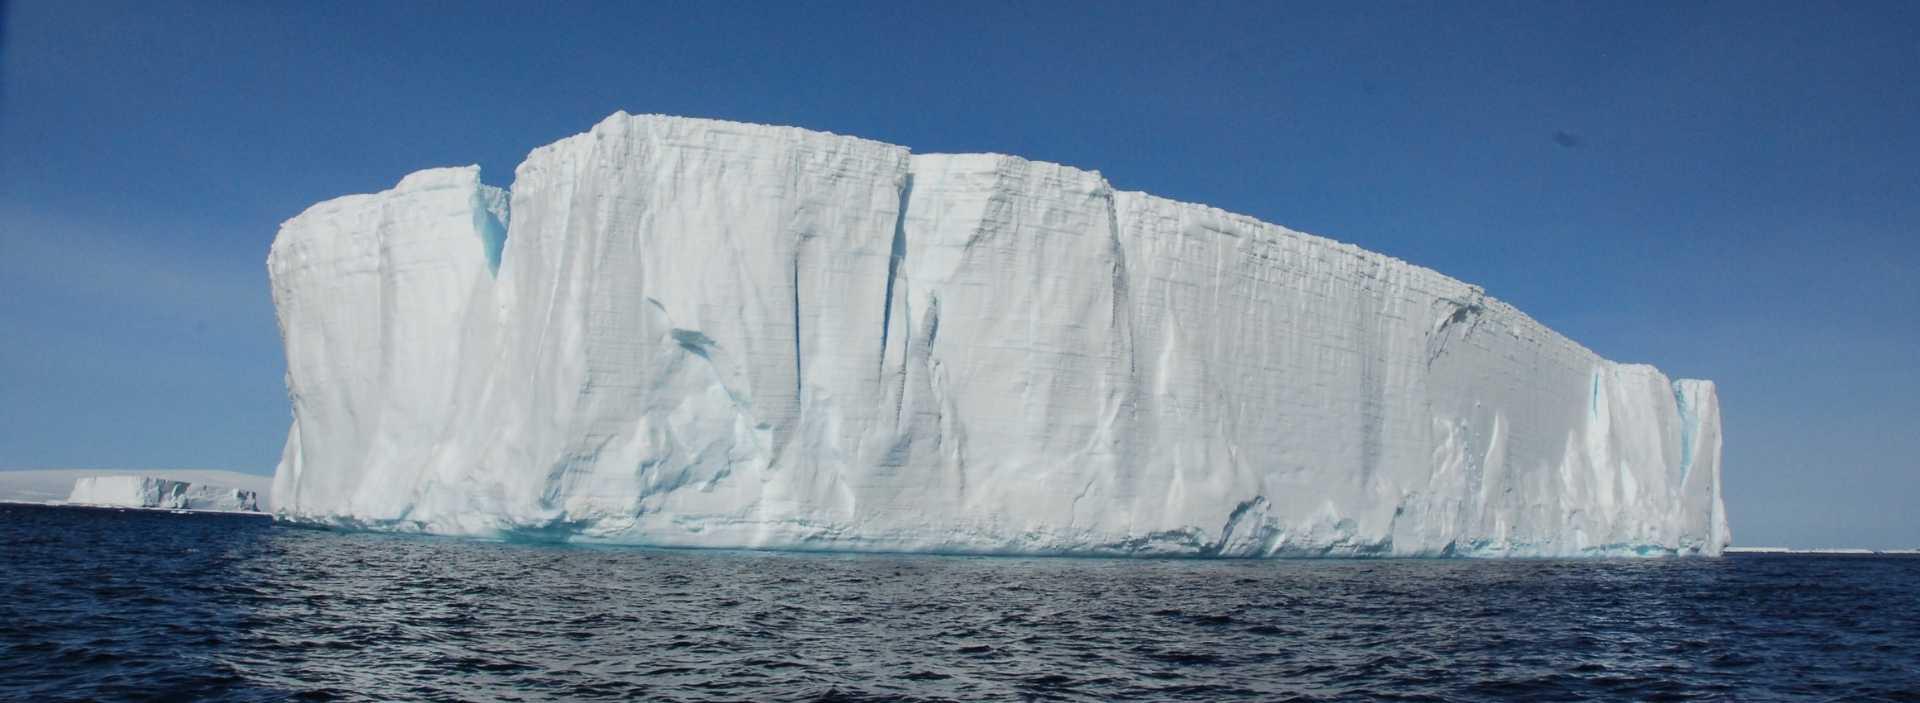 Großer Eisberg im Meer